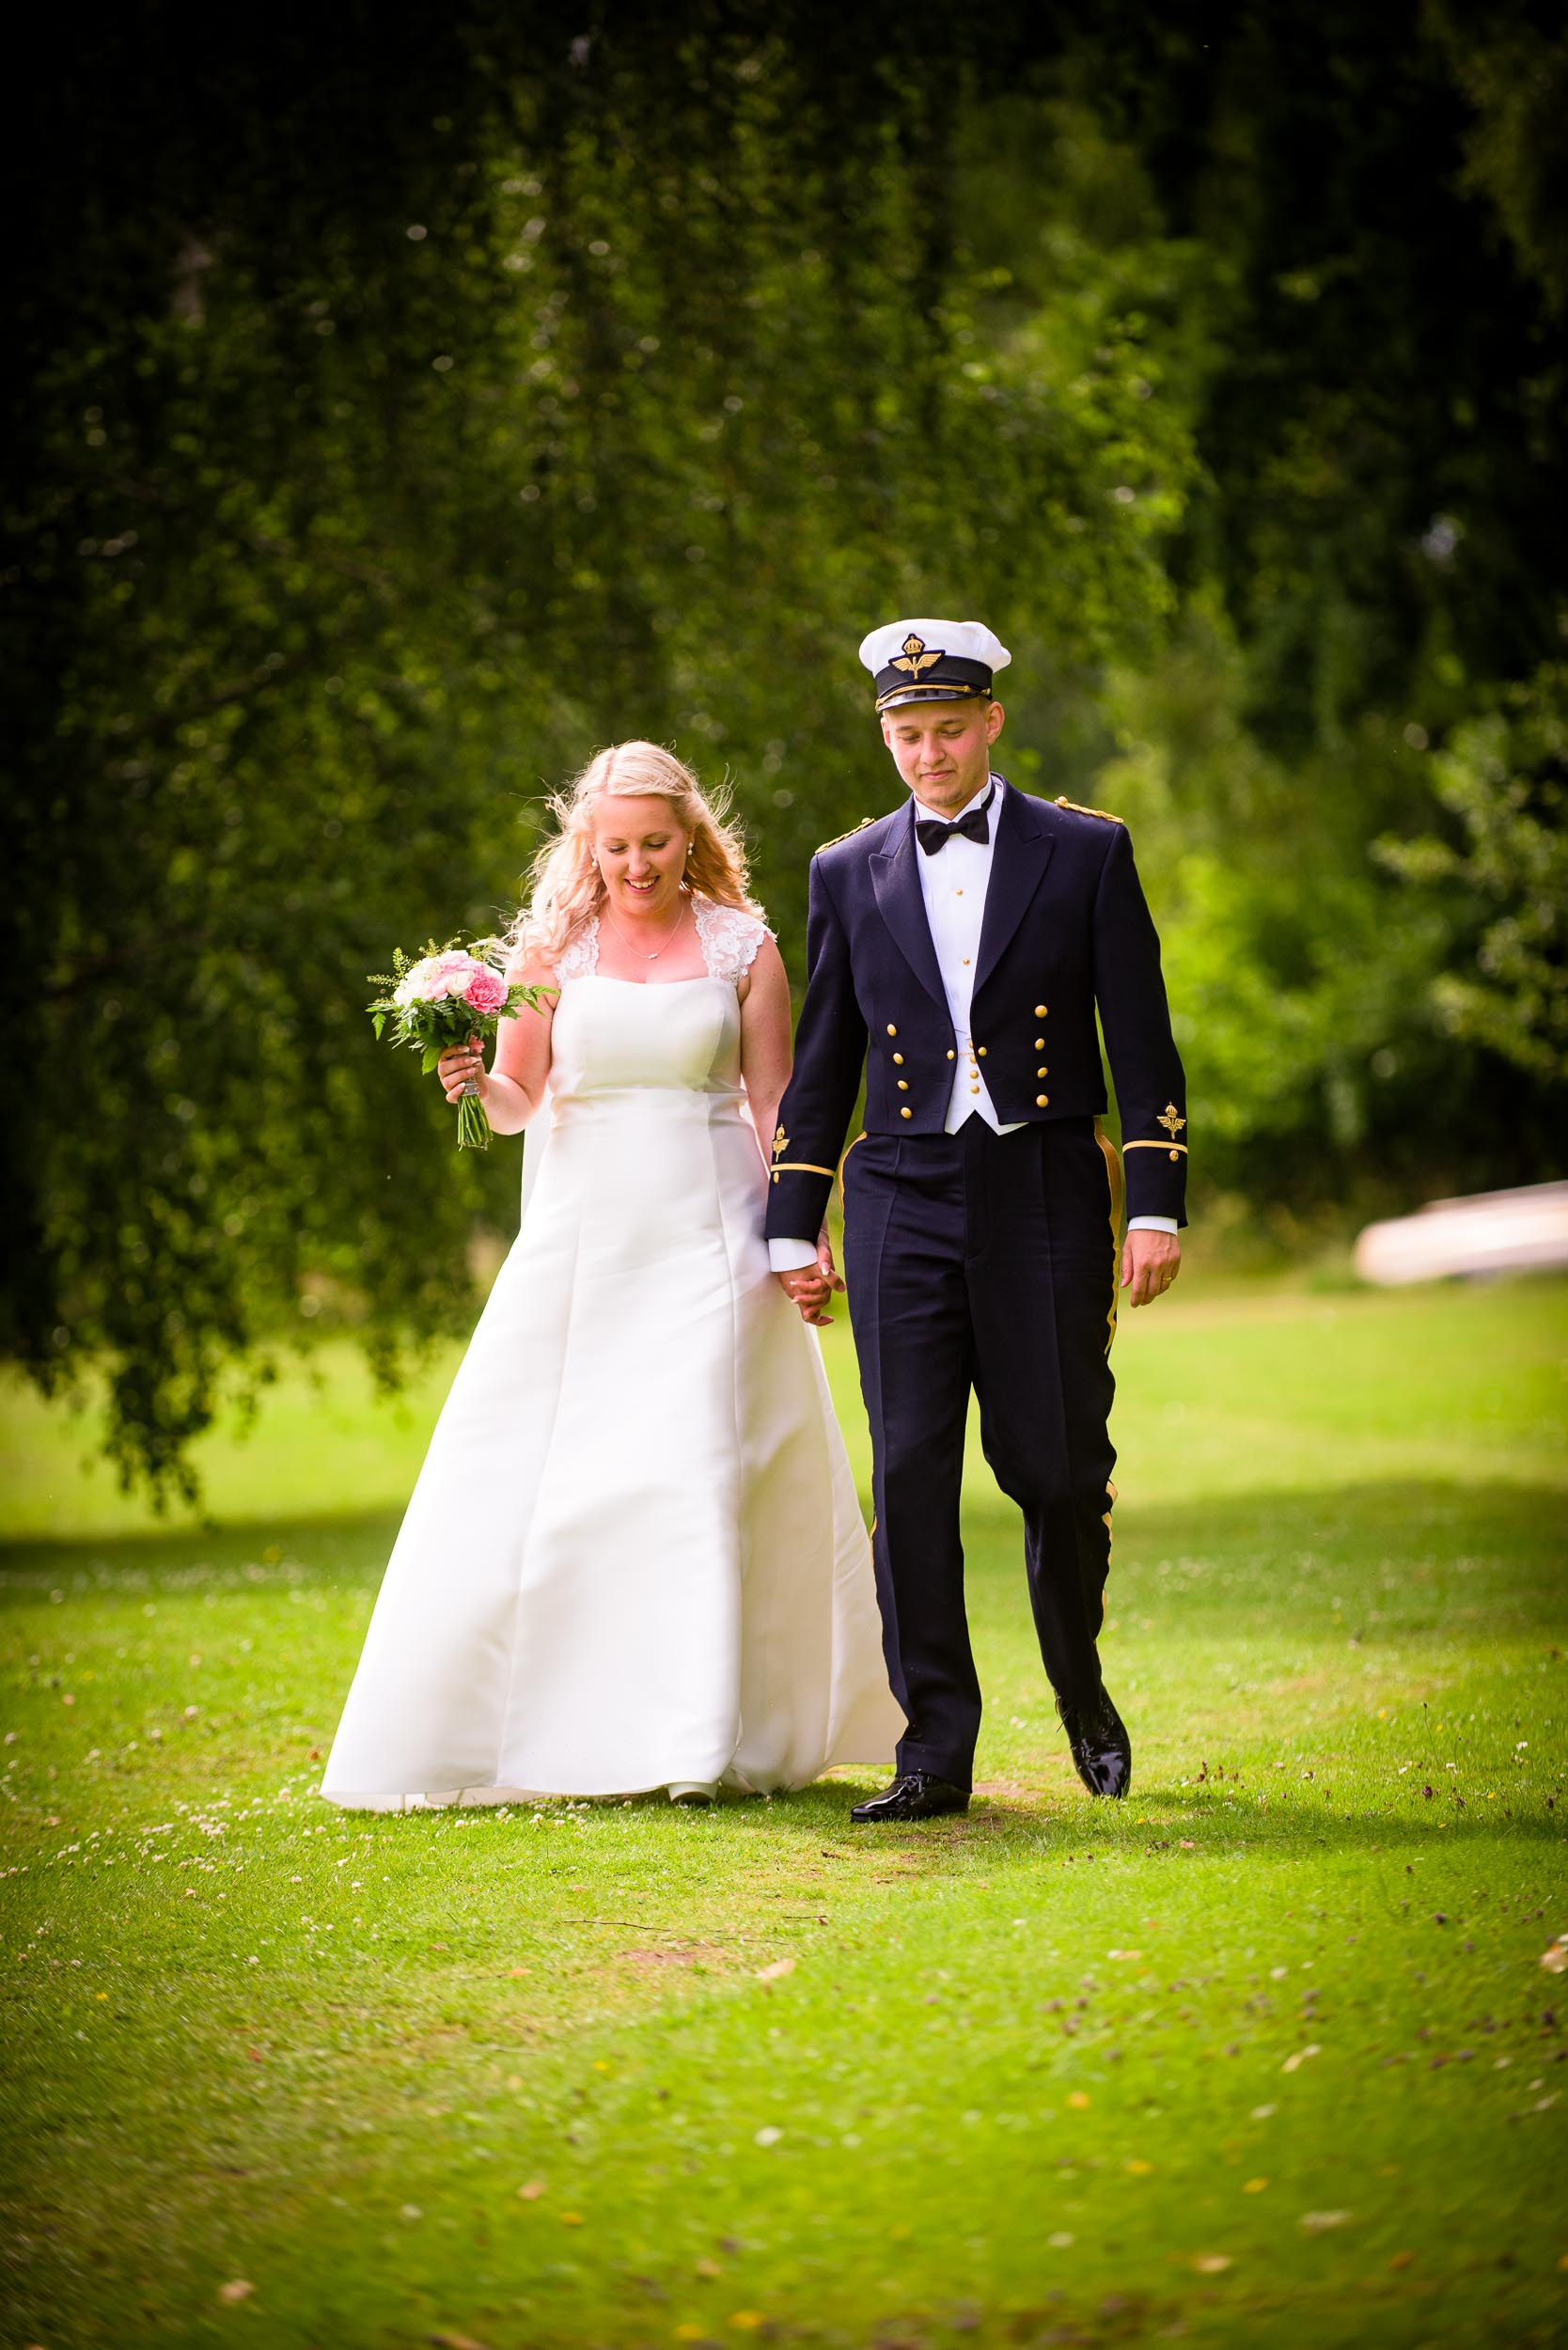 bröllopsfoto-Hässleholm-juli17-1.jpg